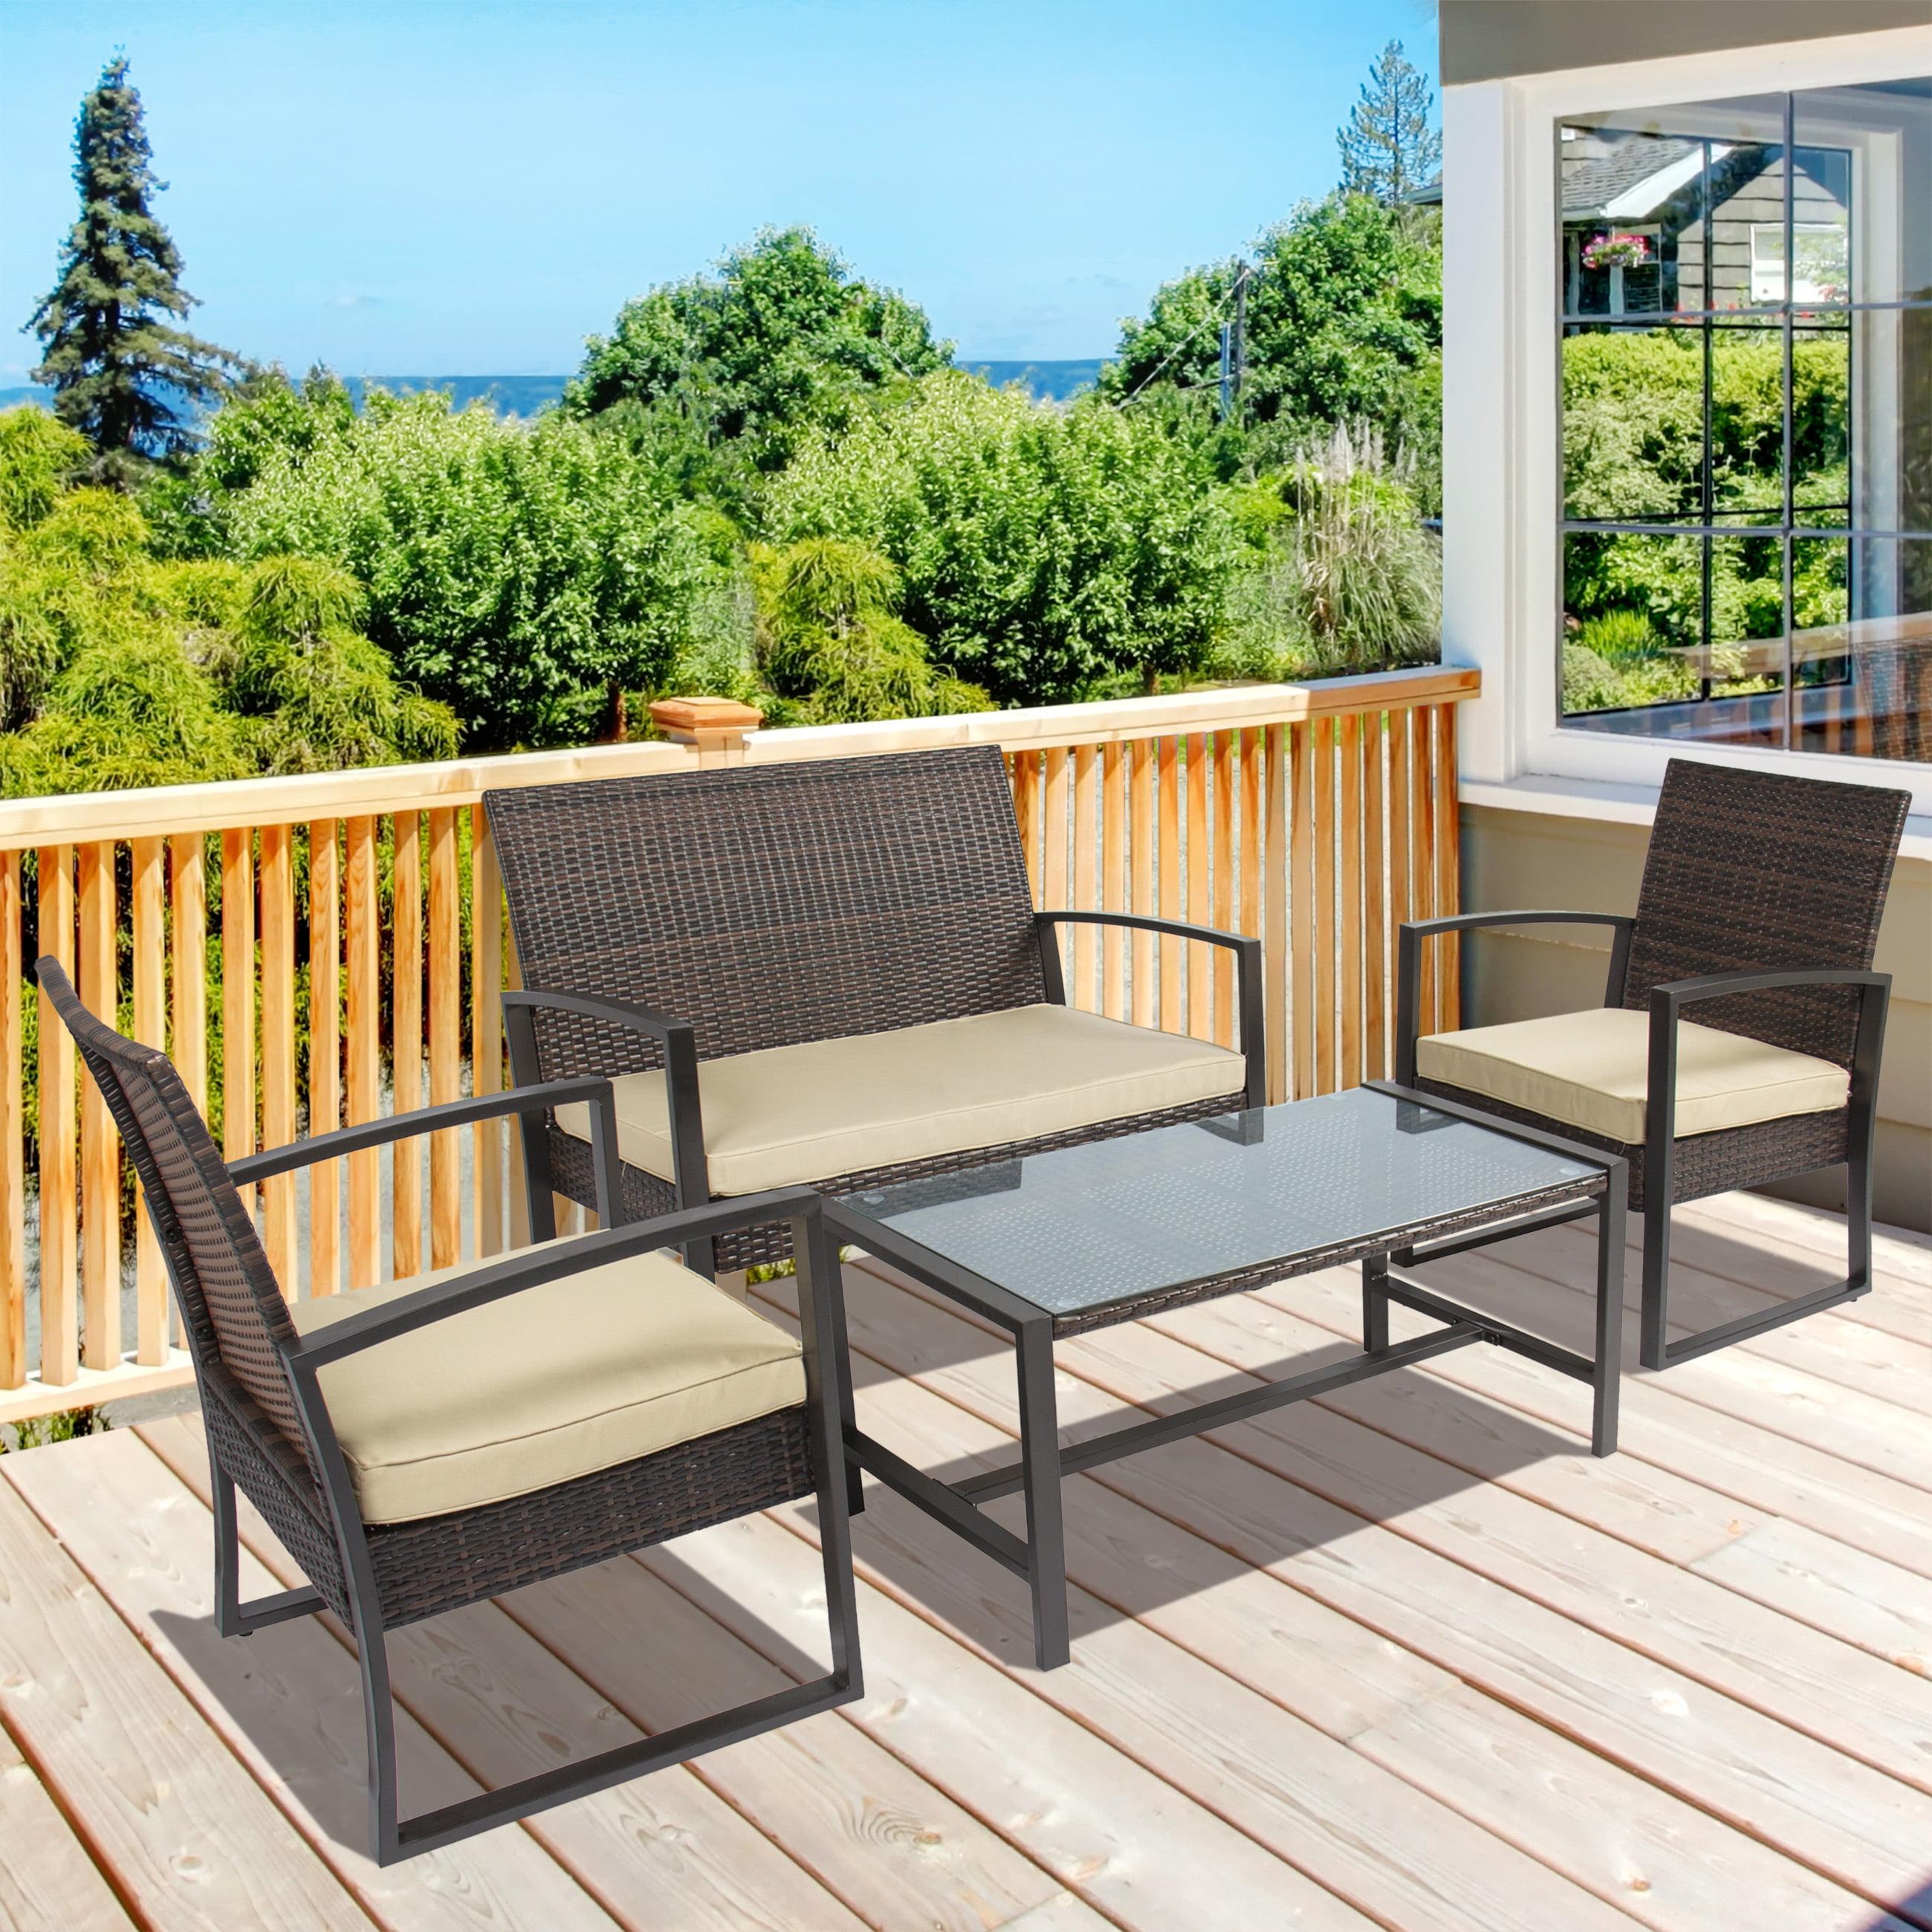 4PC Patio Furniture Set Cushioned Outdoor Wicker Rattan Garden Lawn